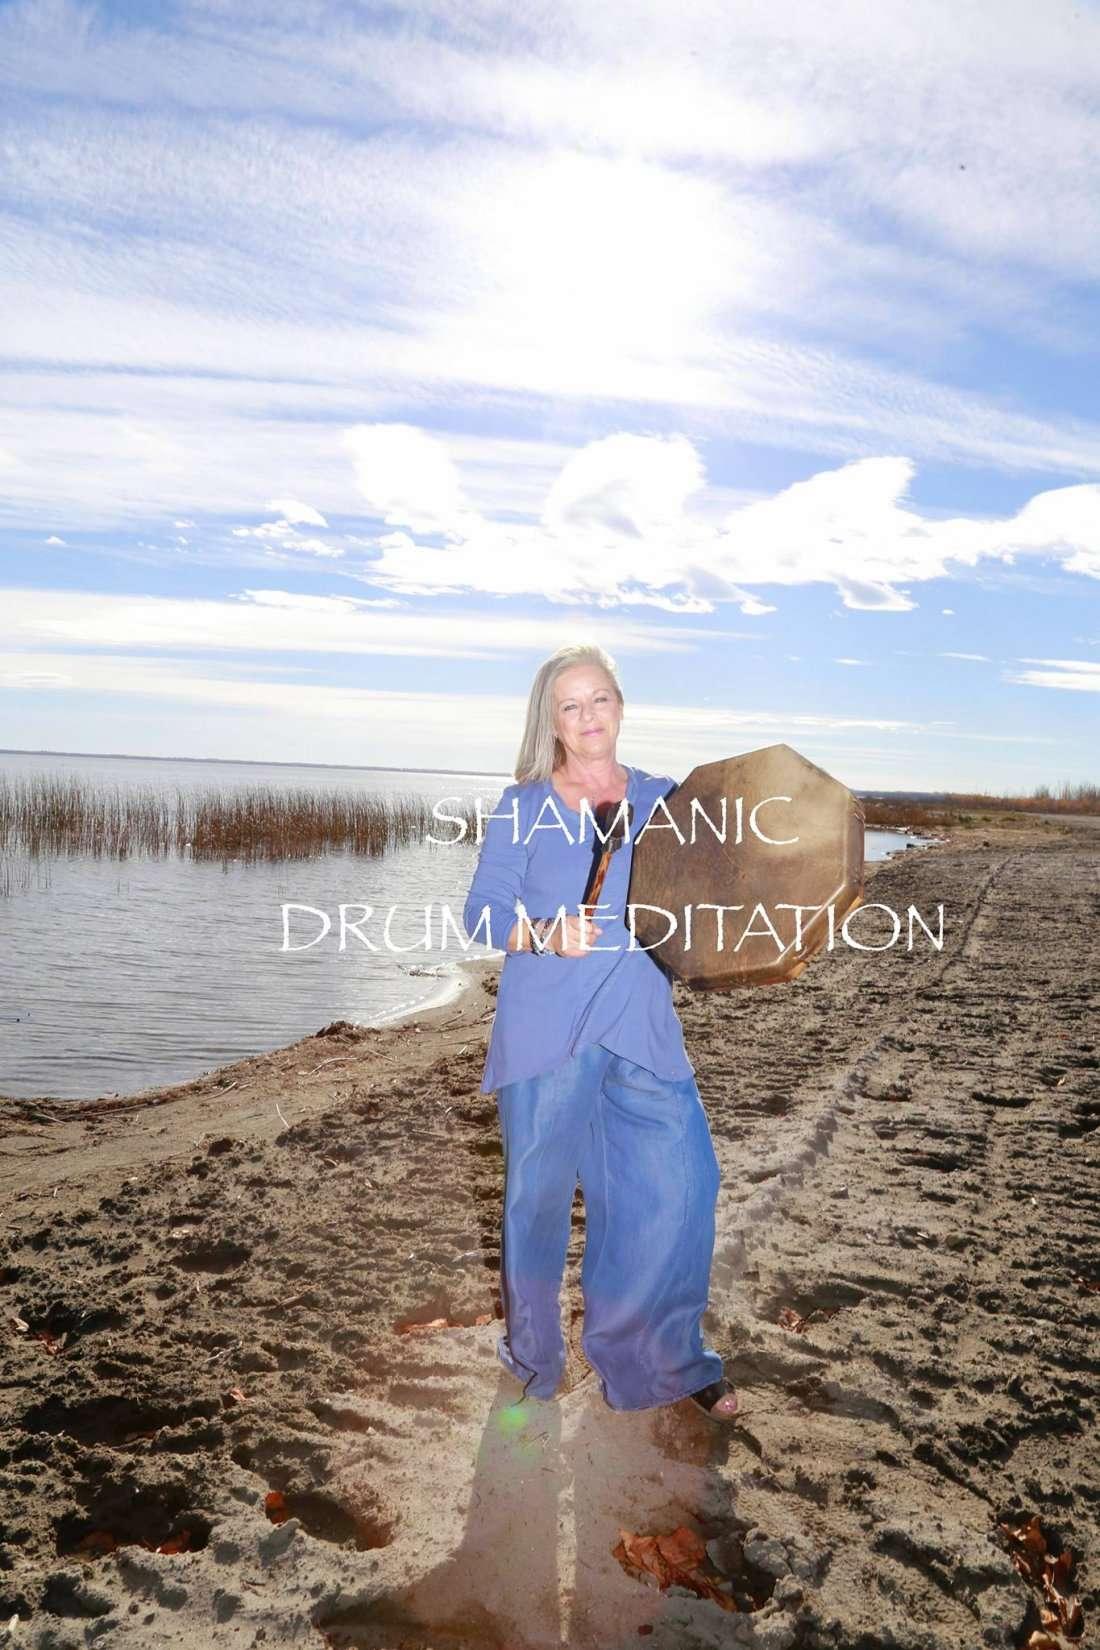 Recapilation A Shamanic Drum Journey Meditation